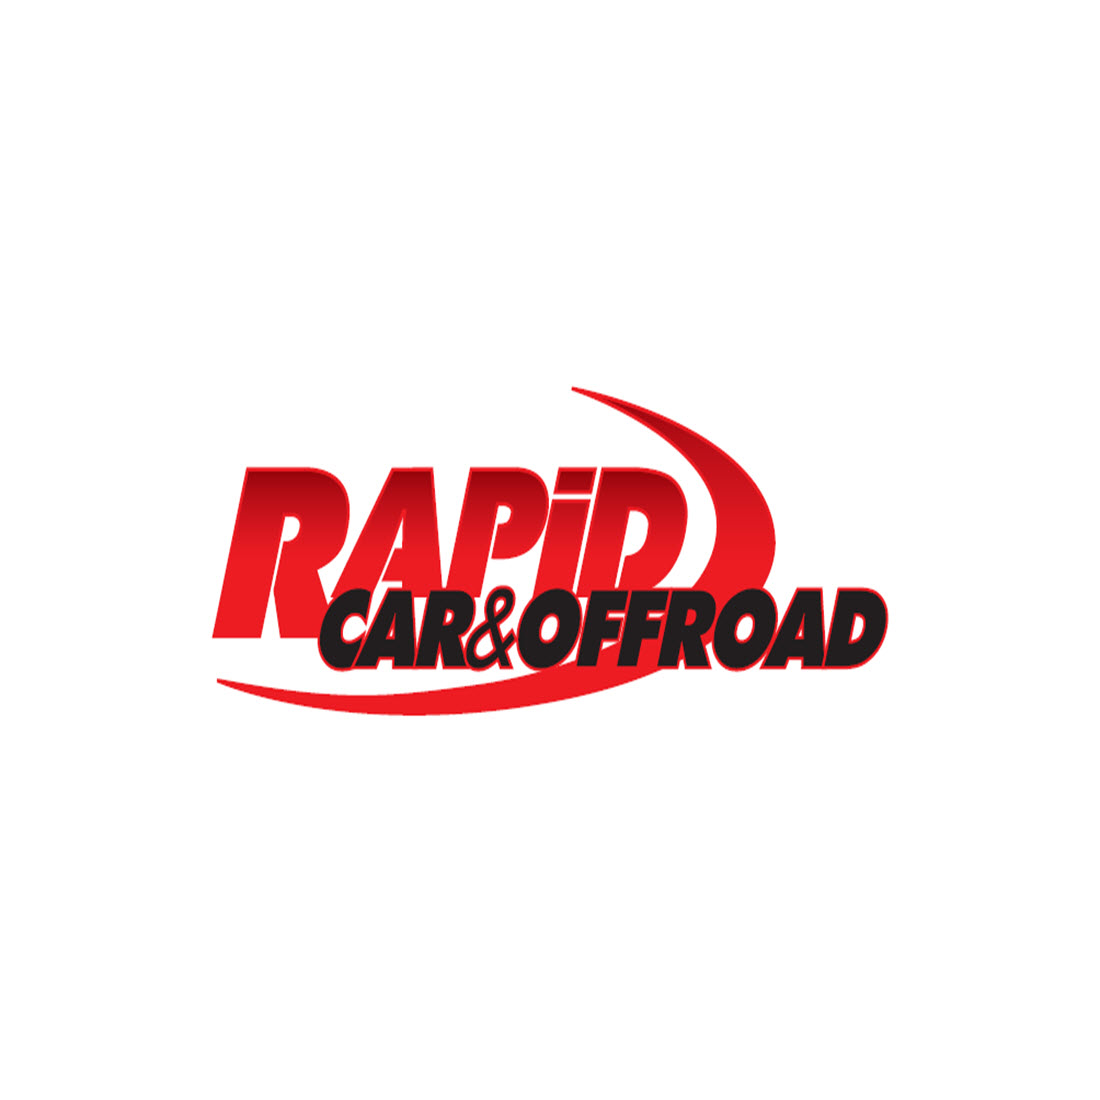 Dimsport rapid car